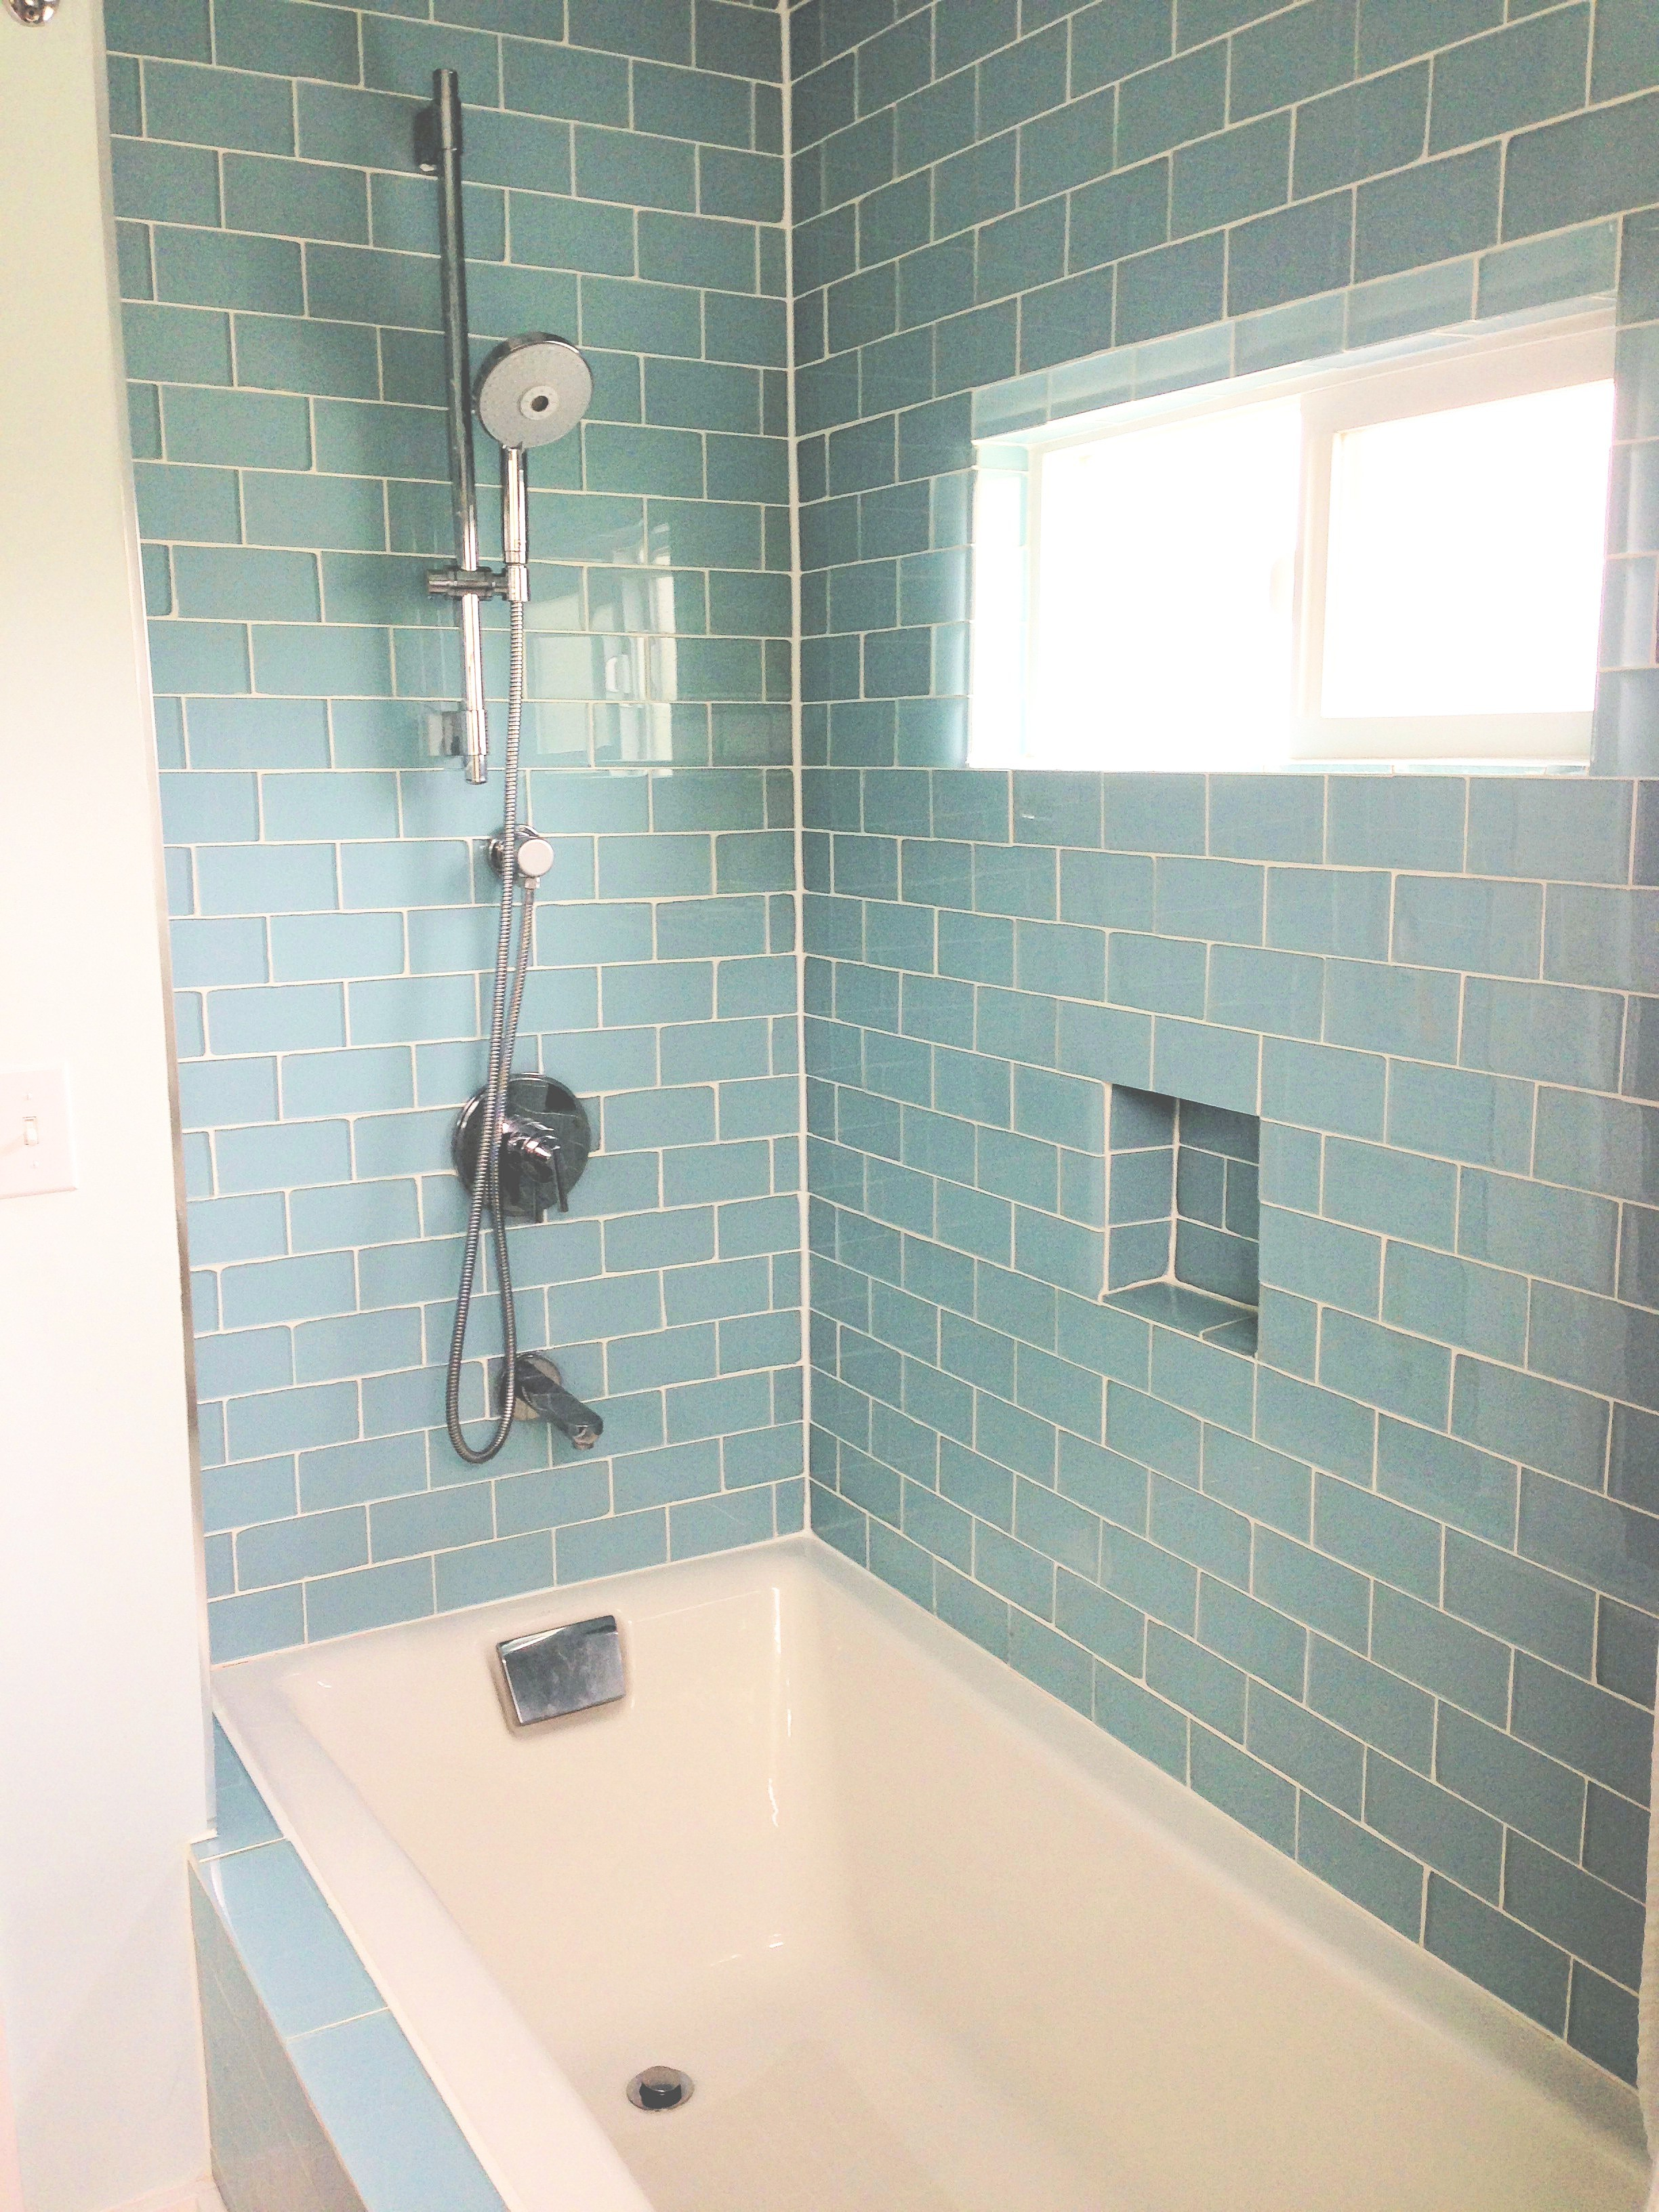 Elegant Glass Tiles for Bathroom Ideas - Bathroom Design Ideas ...